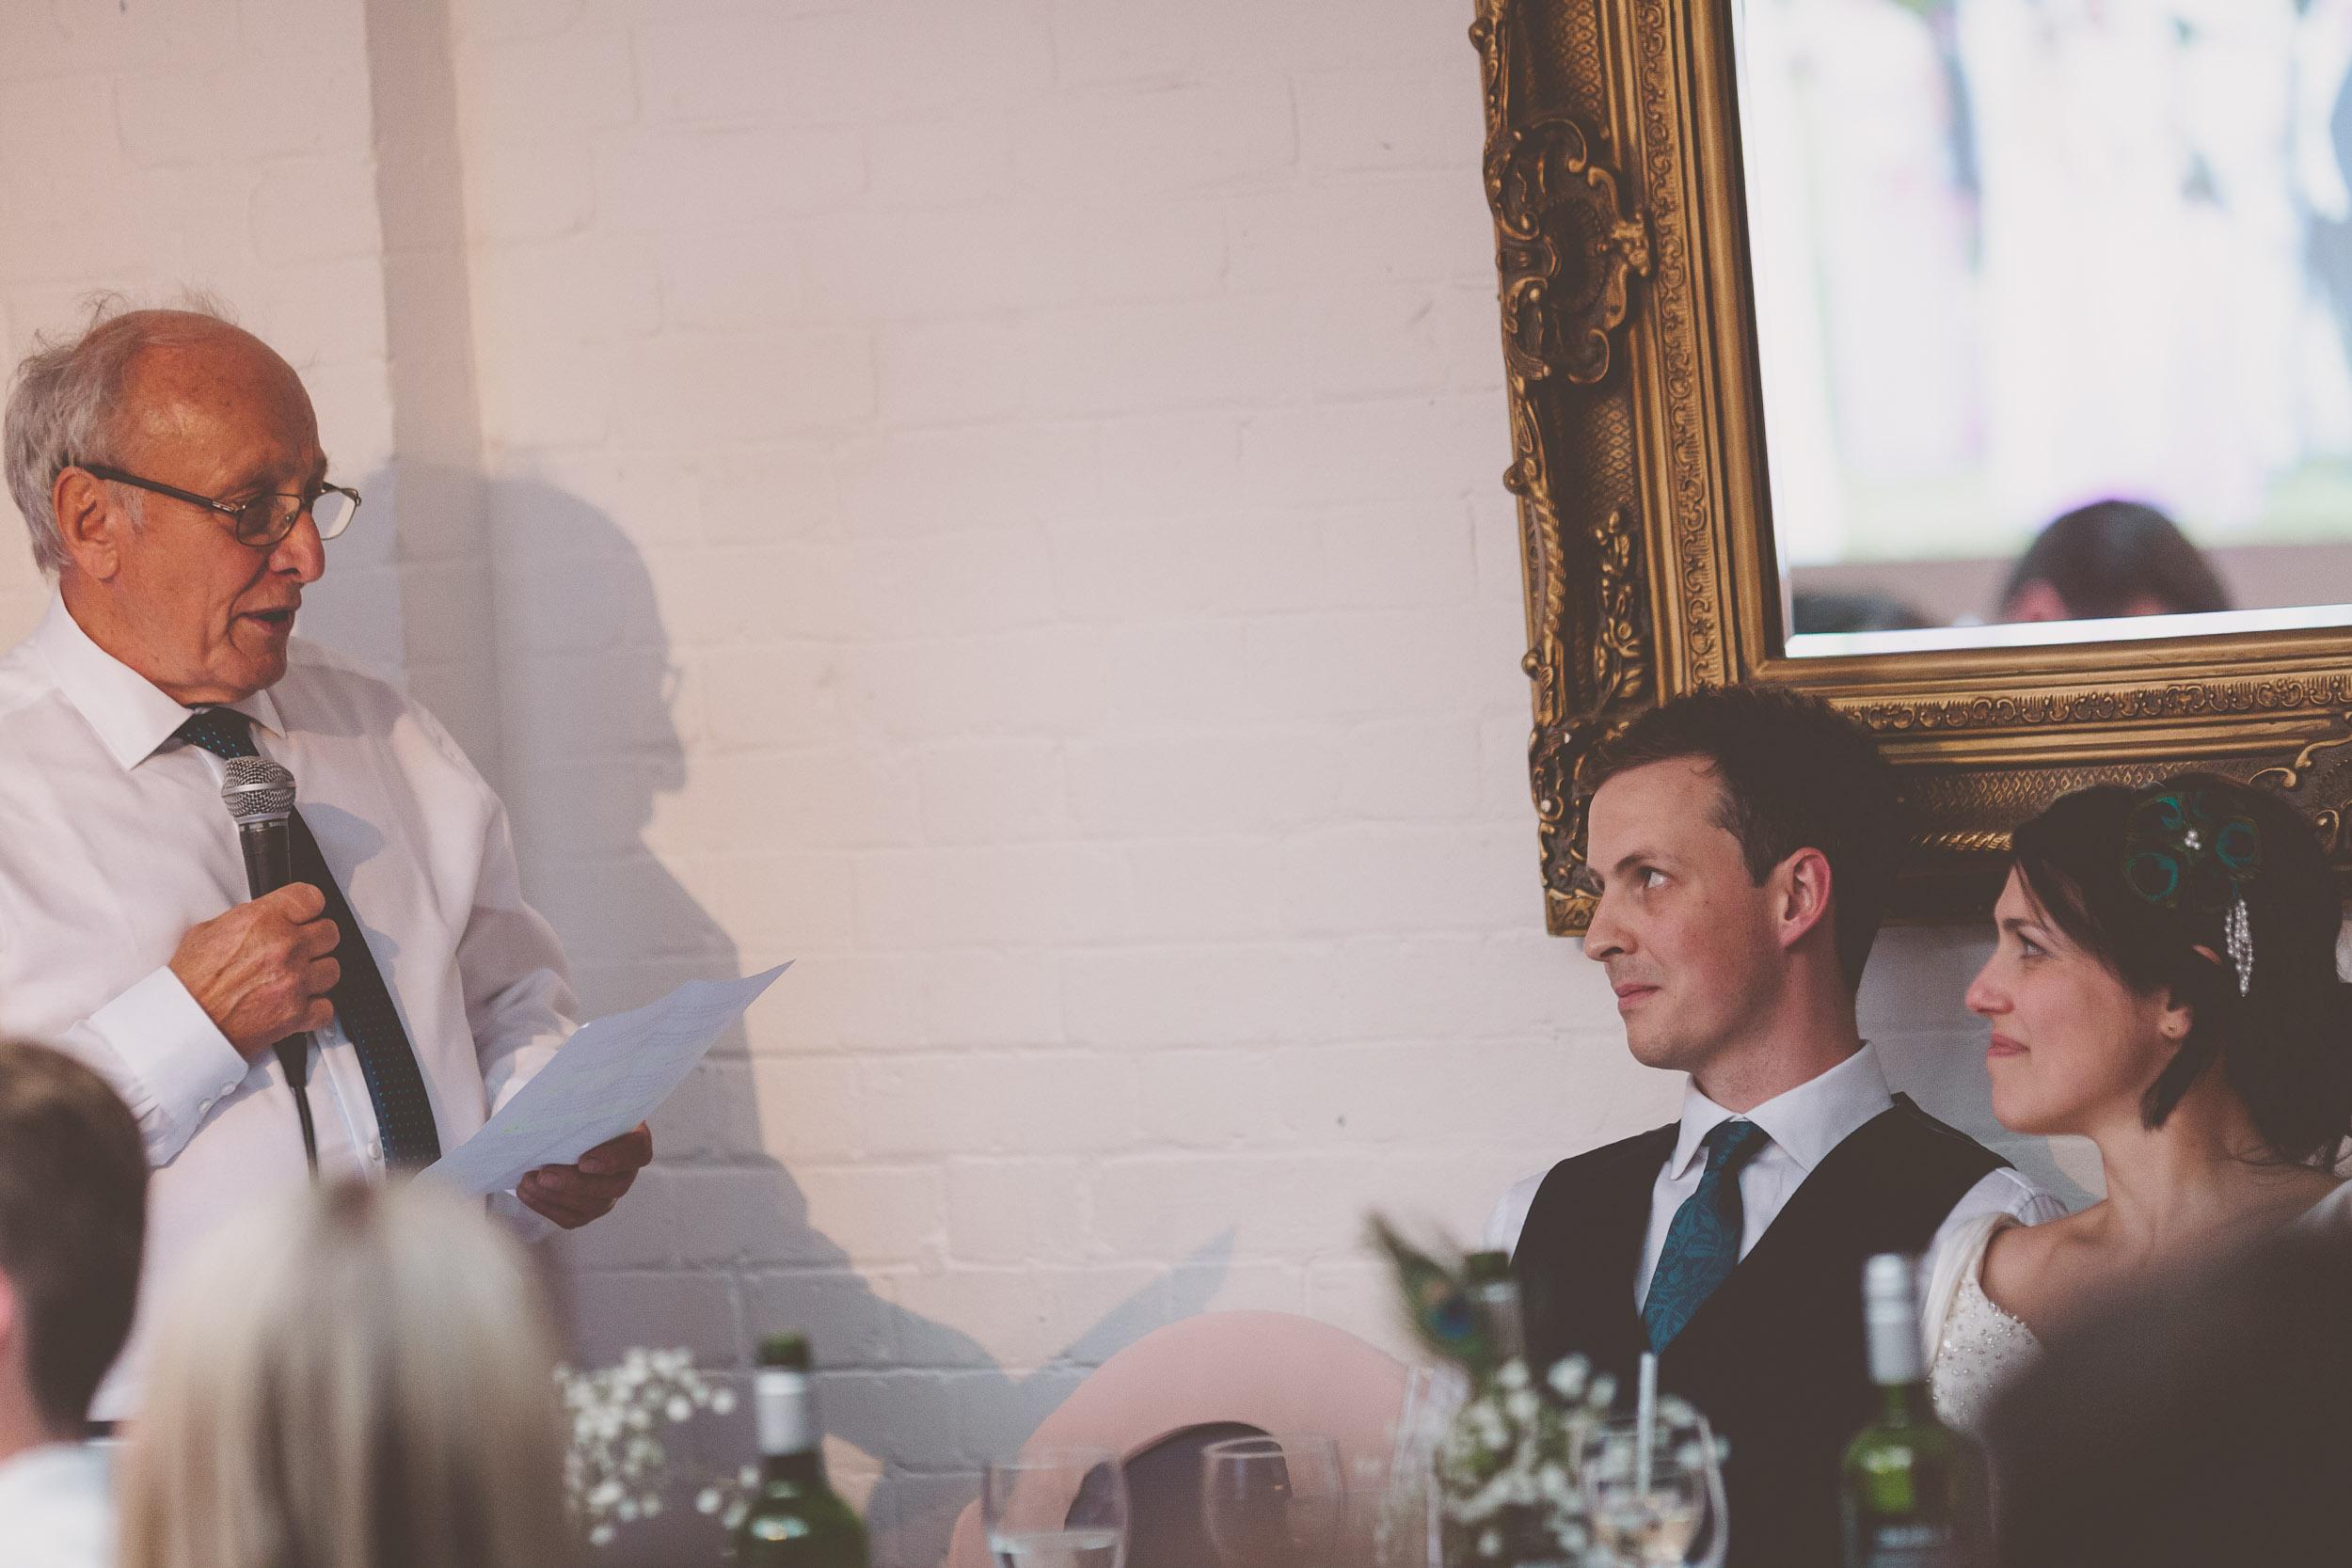 islington-town-hall-4th-floor-studios-wedding370.jpg